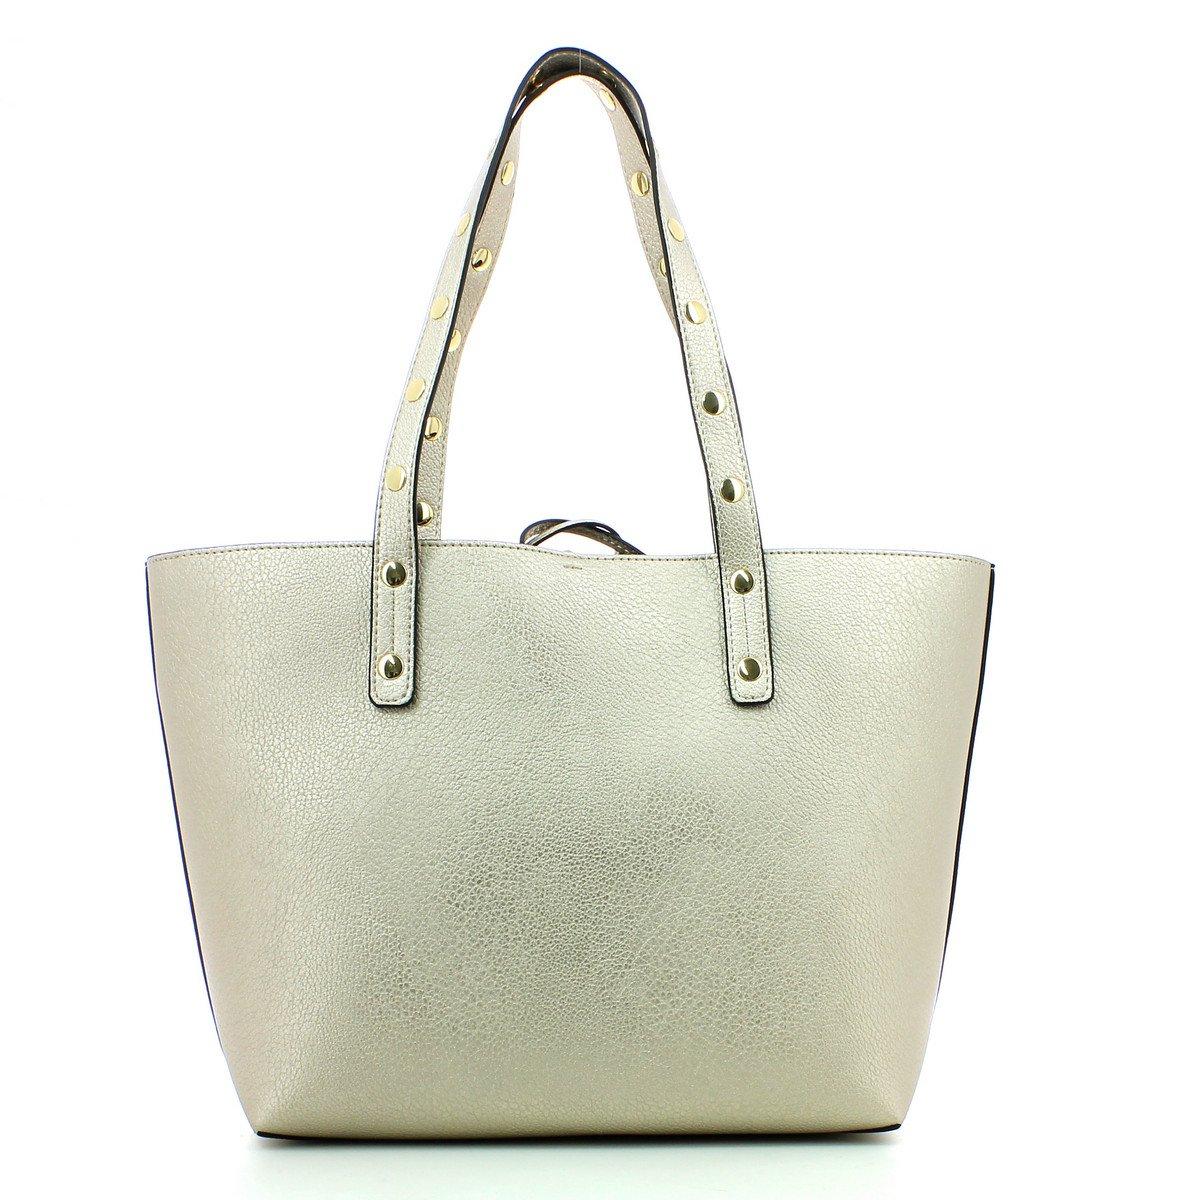 Liu Jo Shopping Reversible Light Gold black  Amazon.co.uk  Clothing 3fce525a247